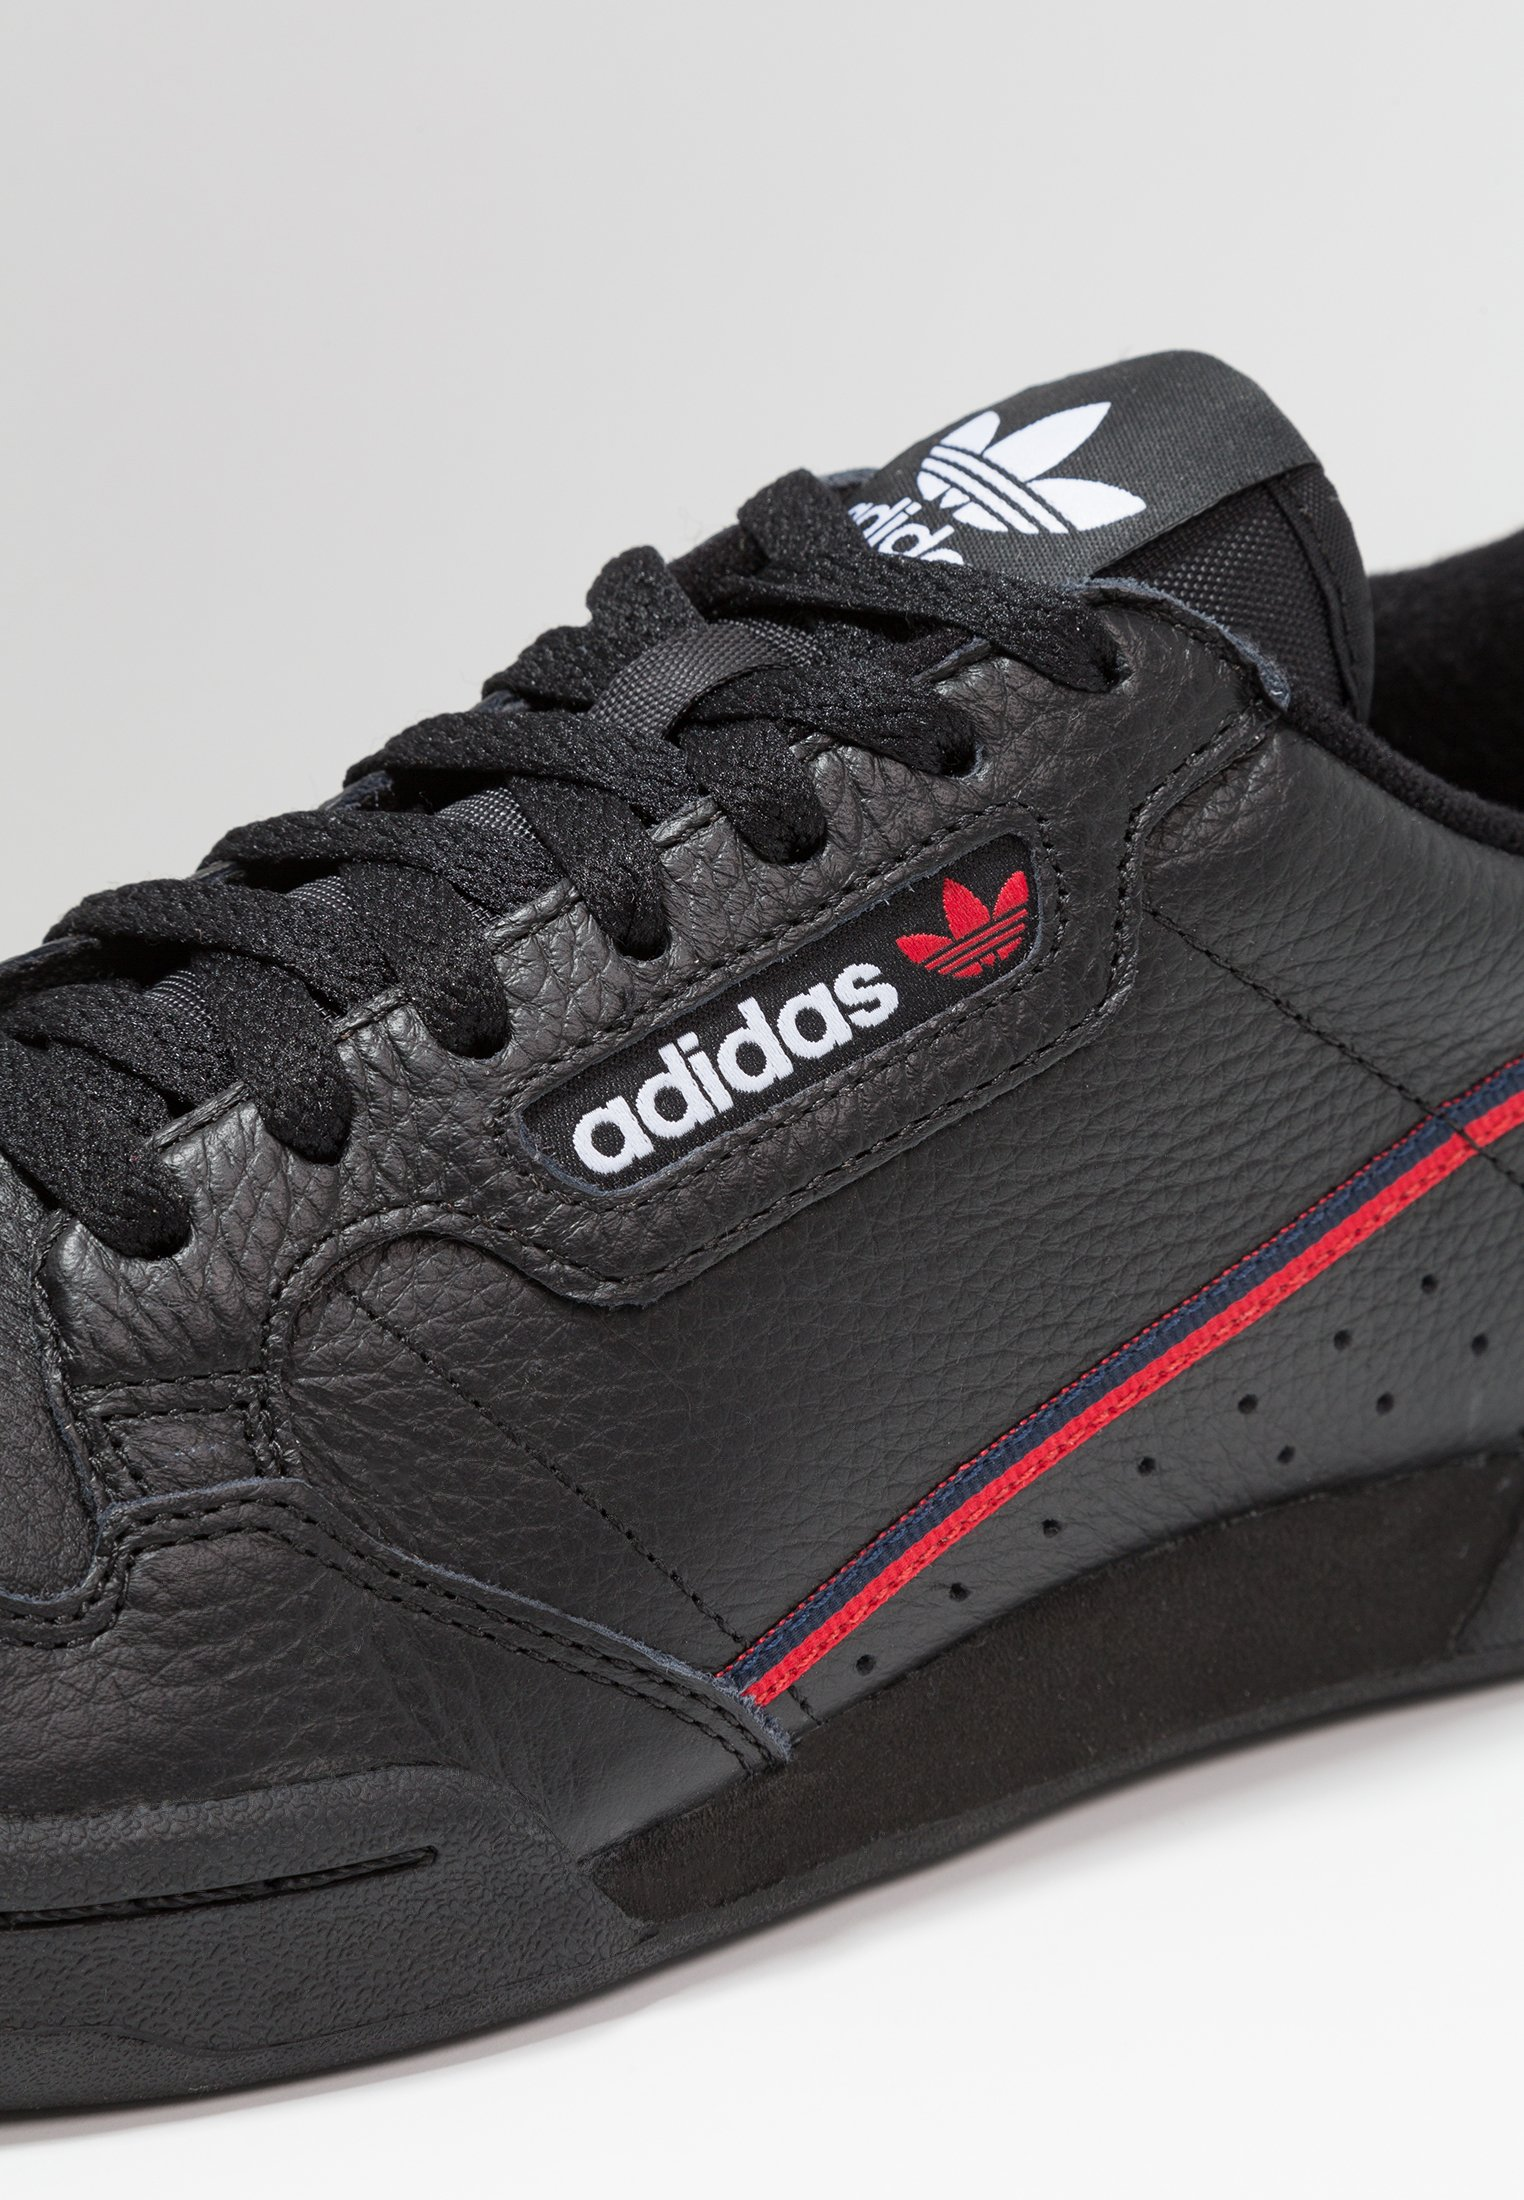 Adidas Originals Continental 80 Skateboard Shoes - Sneakers Core Black/scarlet/collegiate Navy